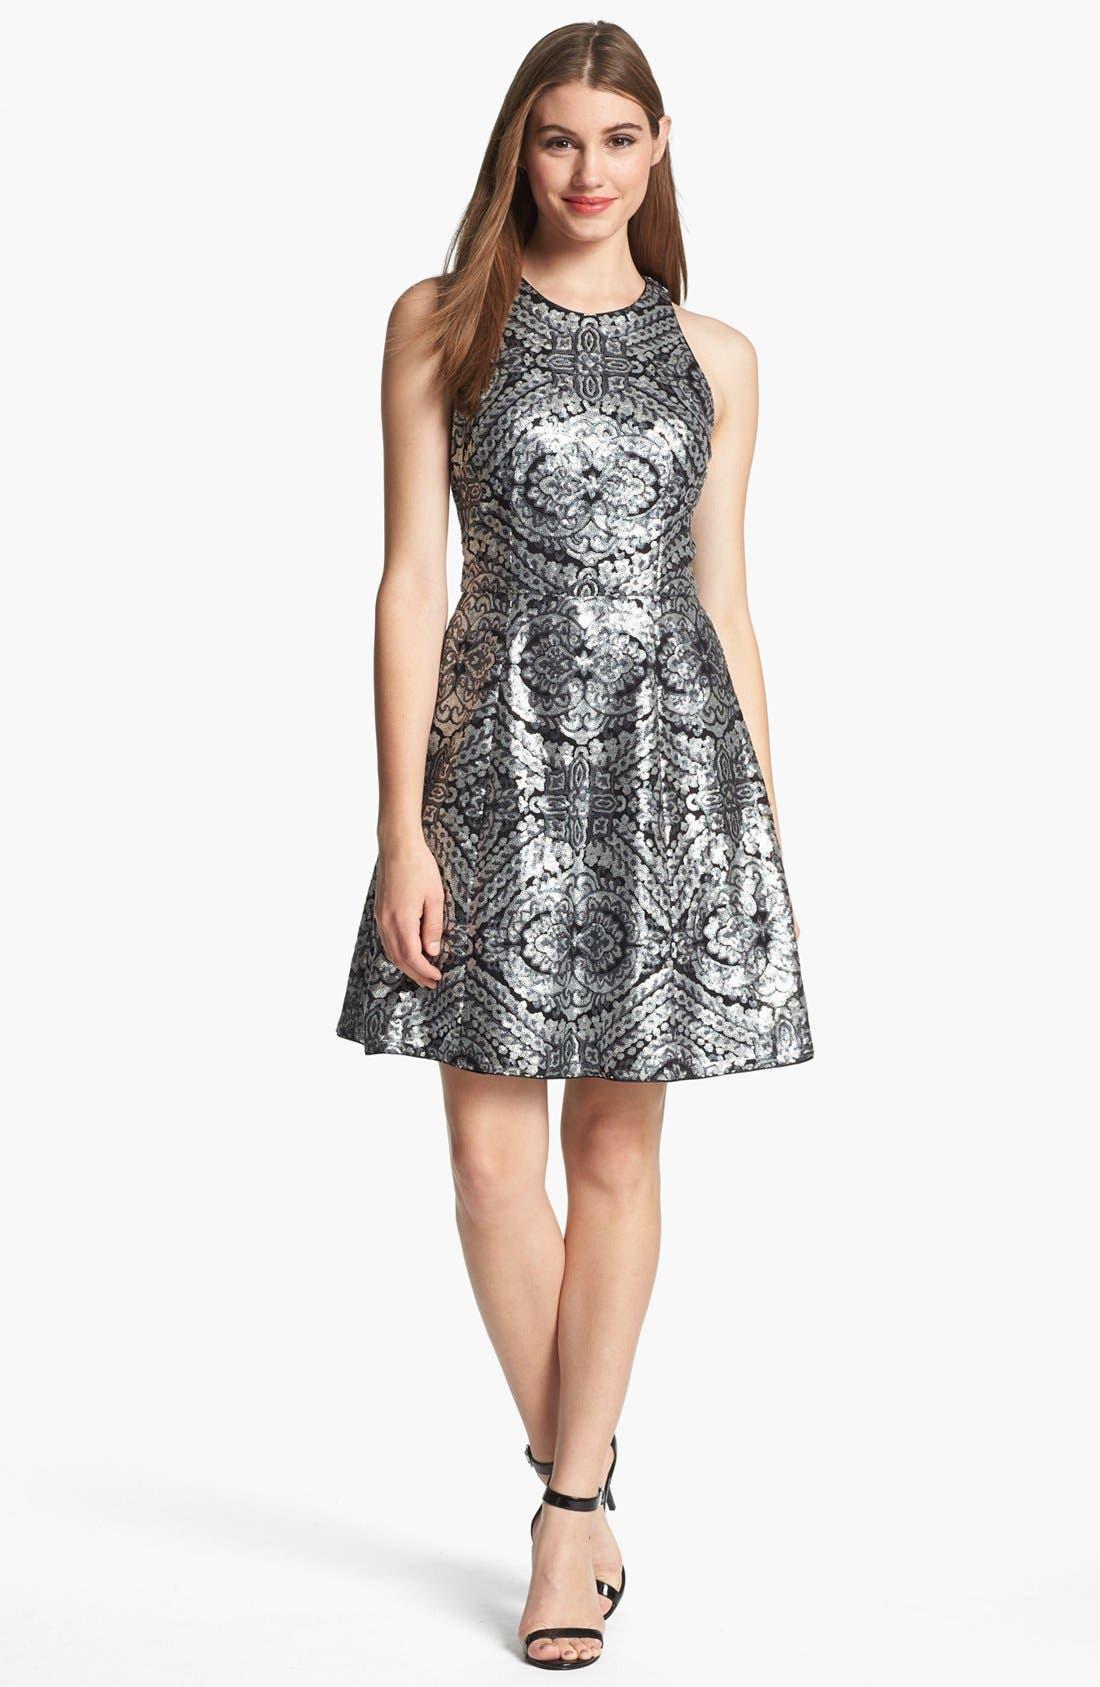 Main Image - Adrianna Papell Racerback Sequin Dress